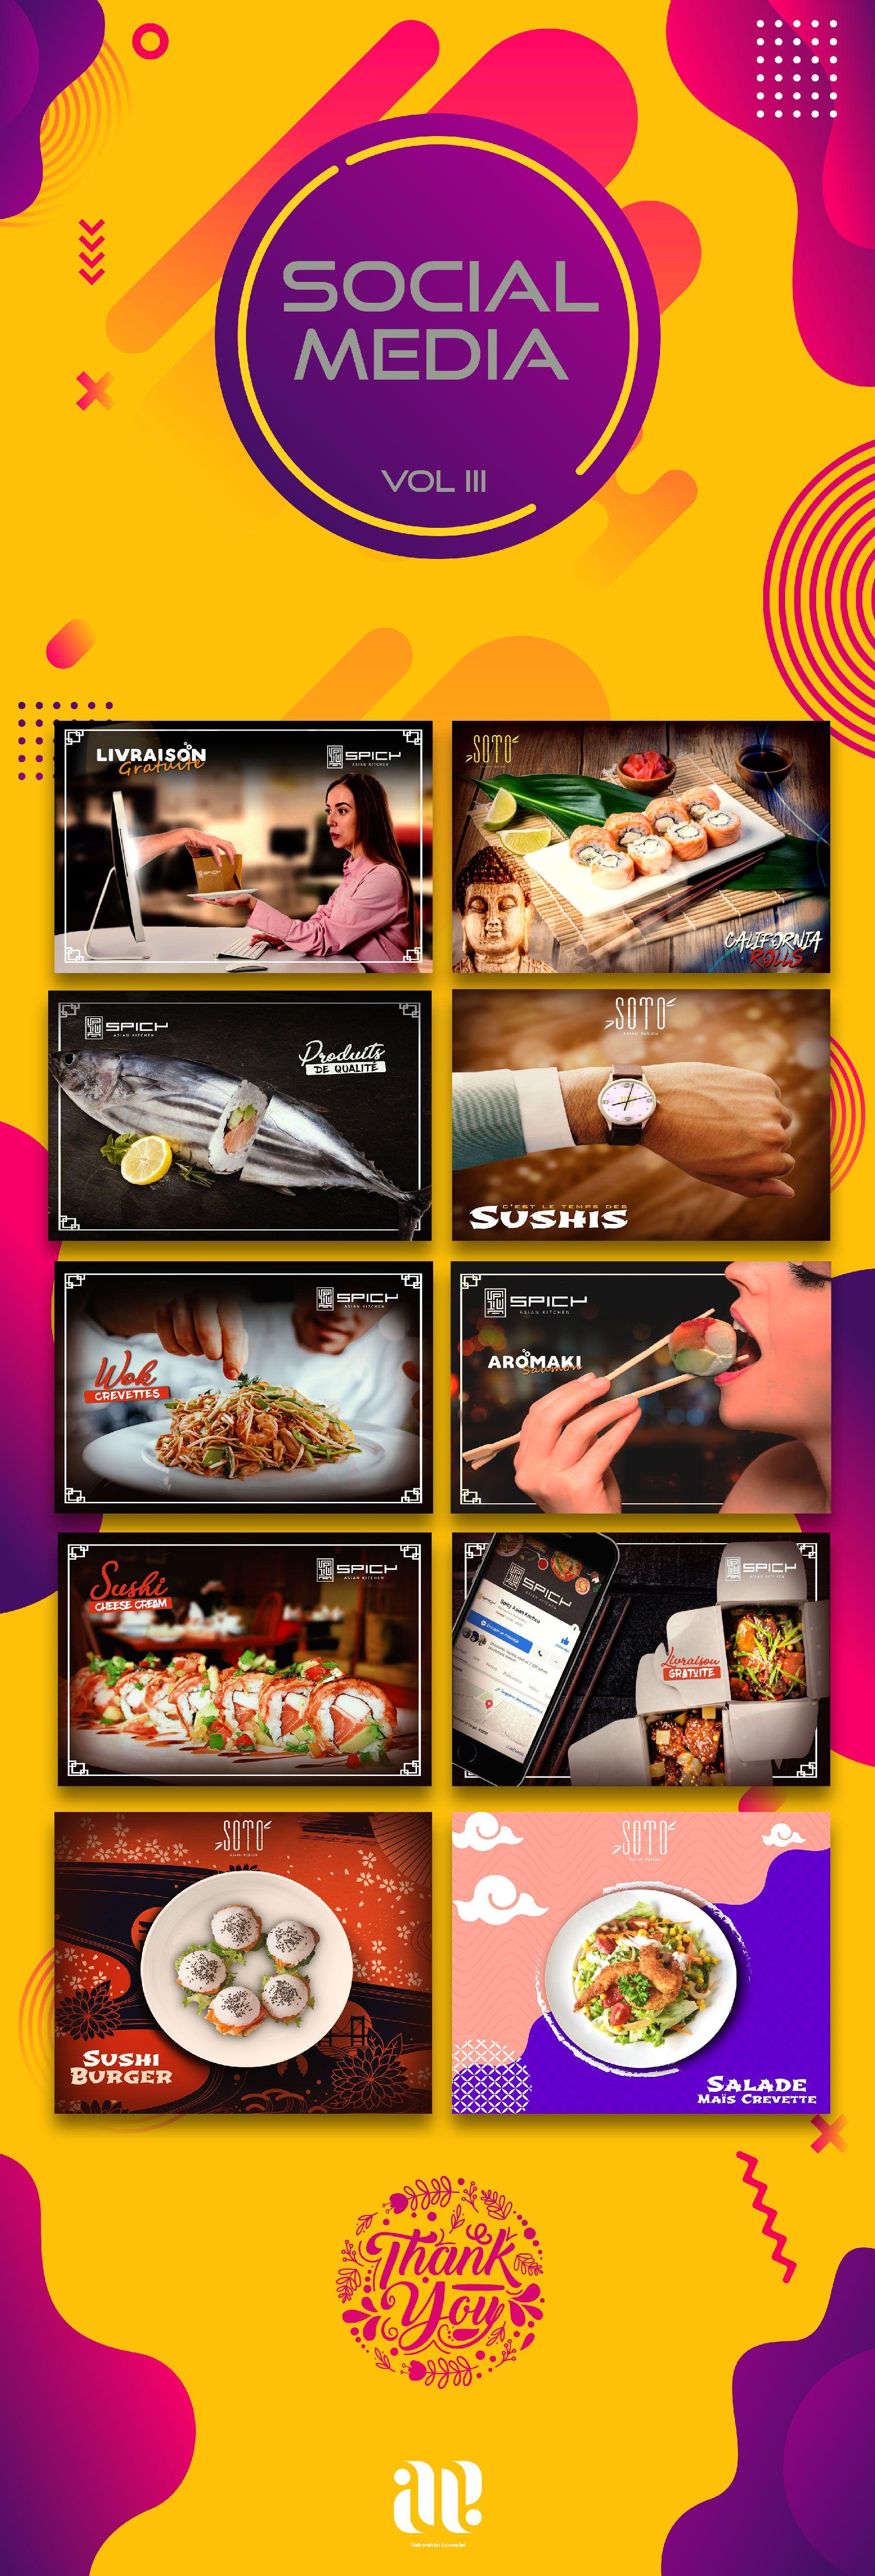 Social Media Japanese Food Asian Kitchen Social Media Japenese Food